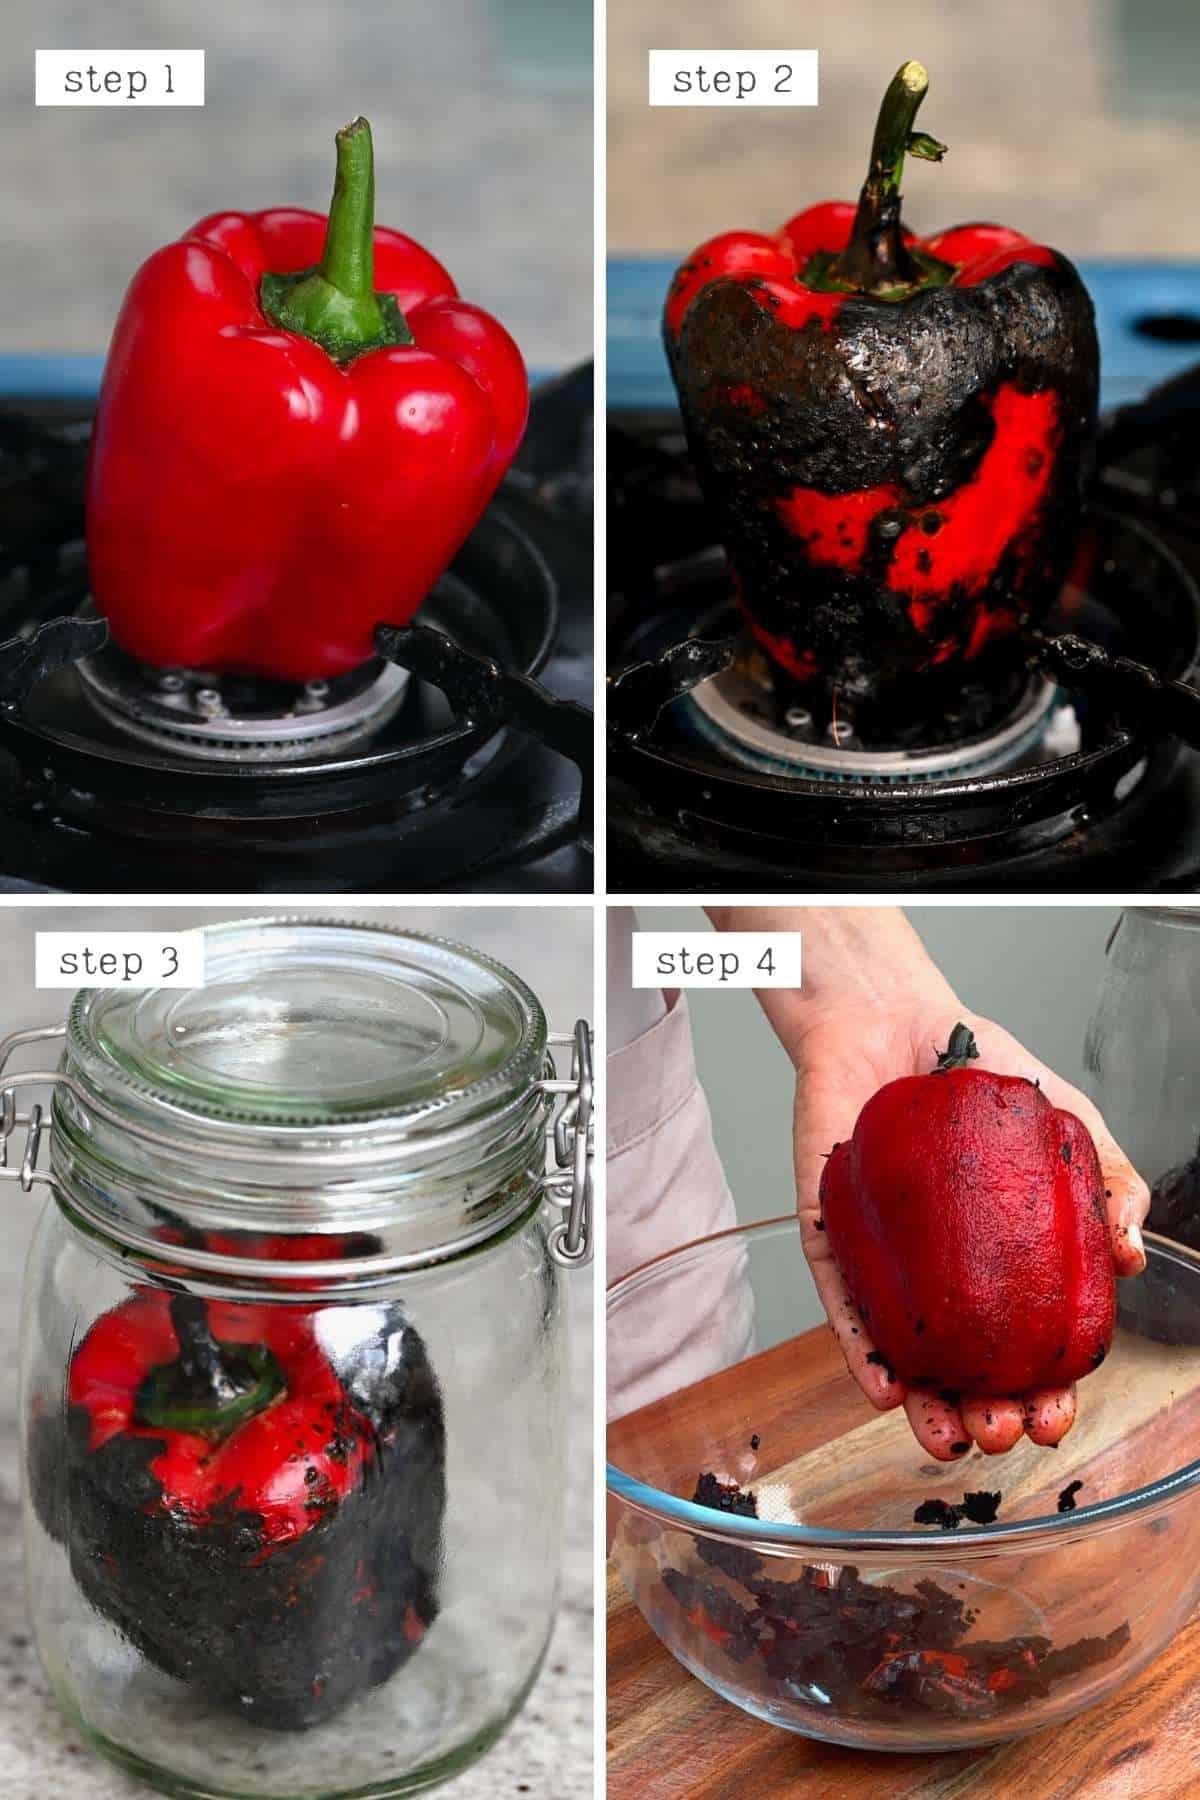 Steps for making roasted red pepper